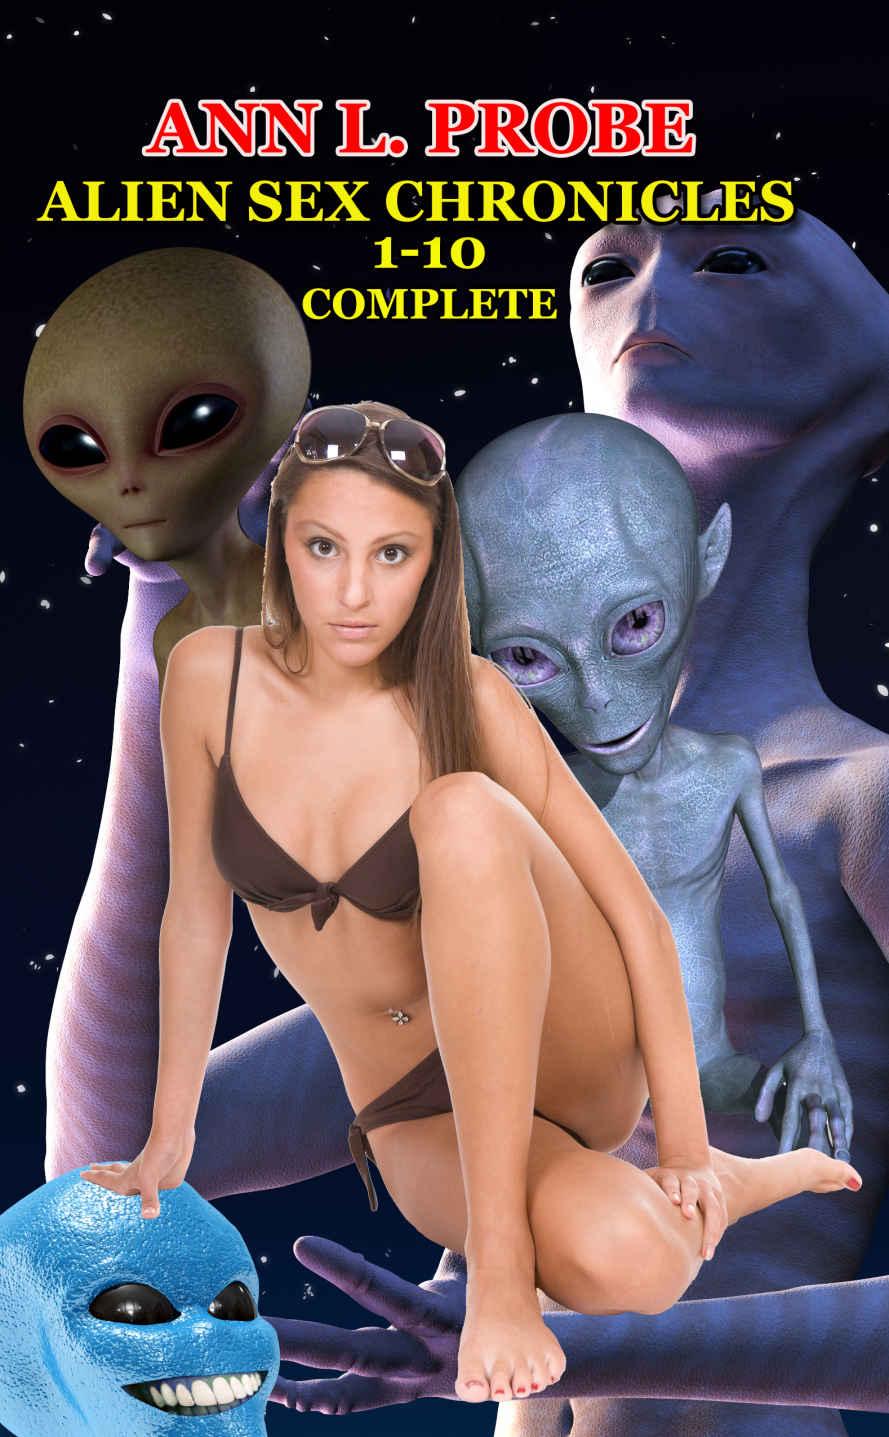 alien sex chronicles ann l. probe